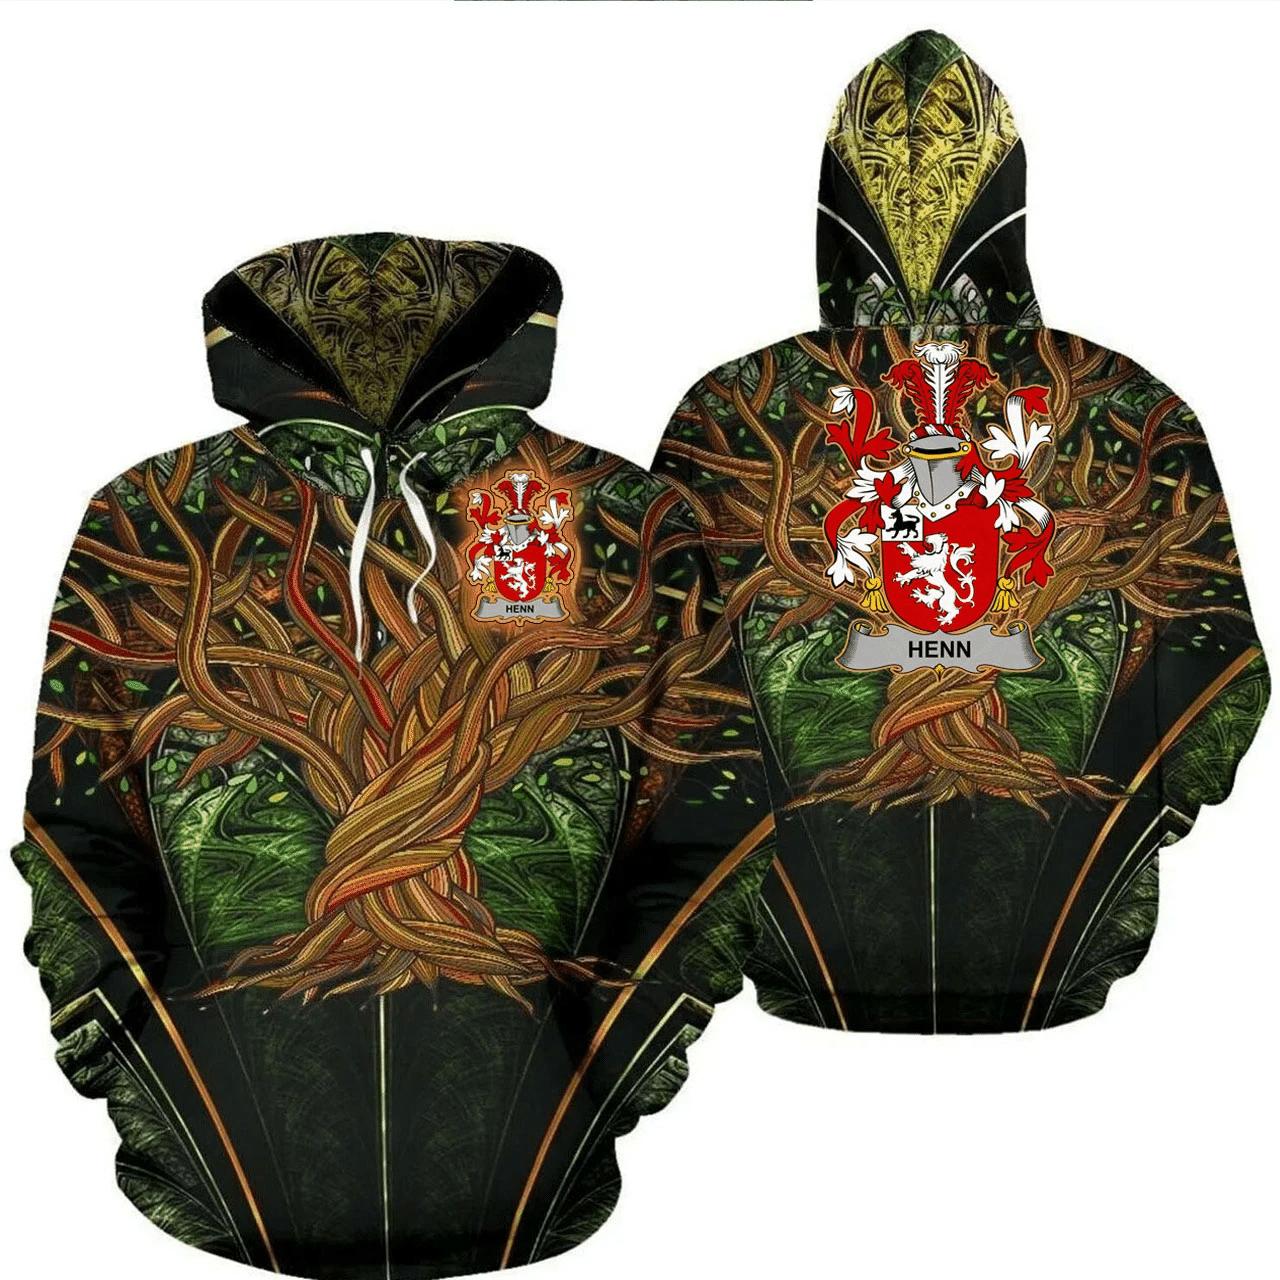 1stIreland Ireland Hoodie - Henn Irish Family Crest Hoodie - Tree Of Life A7